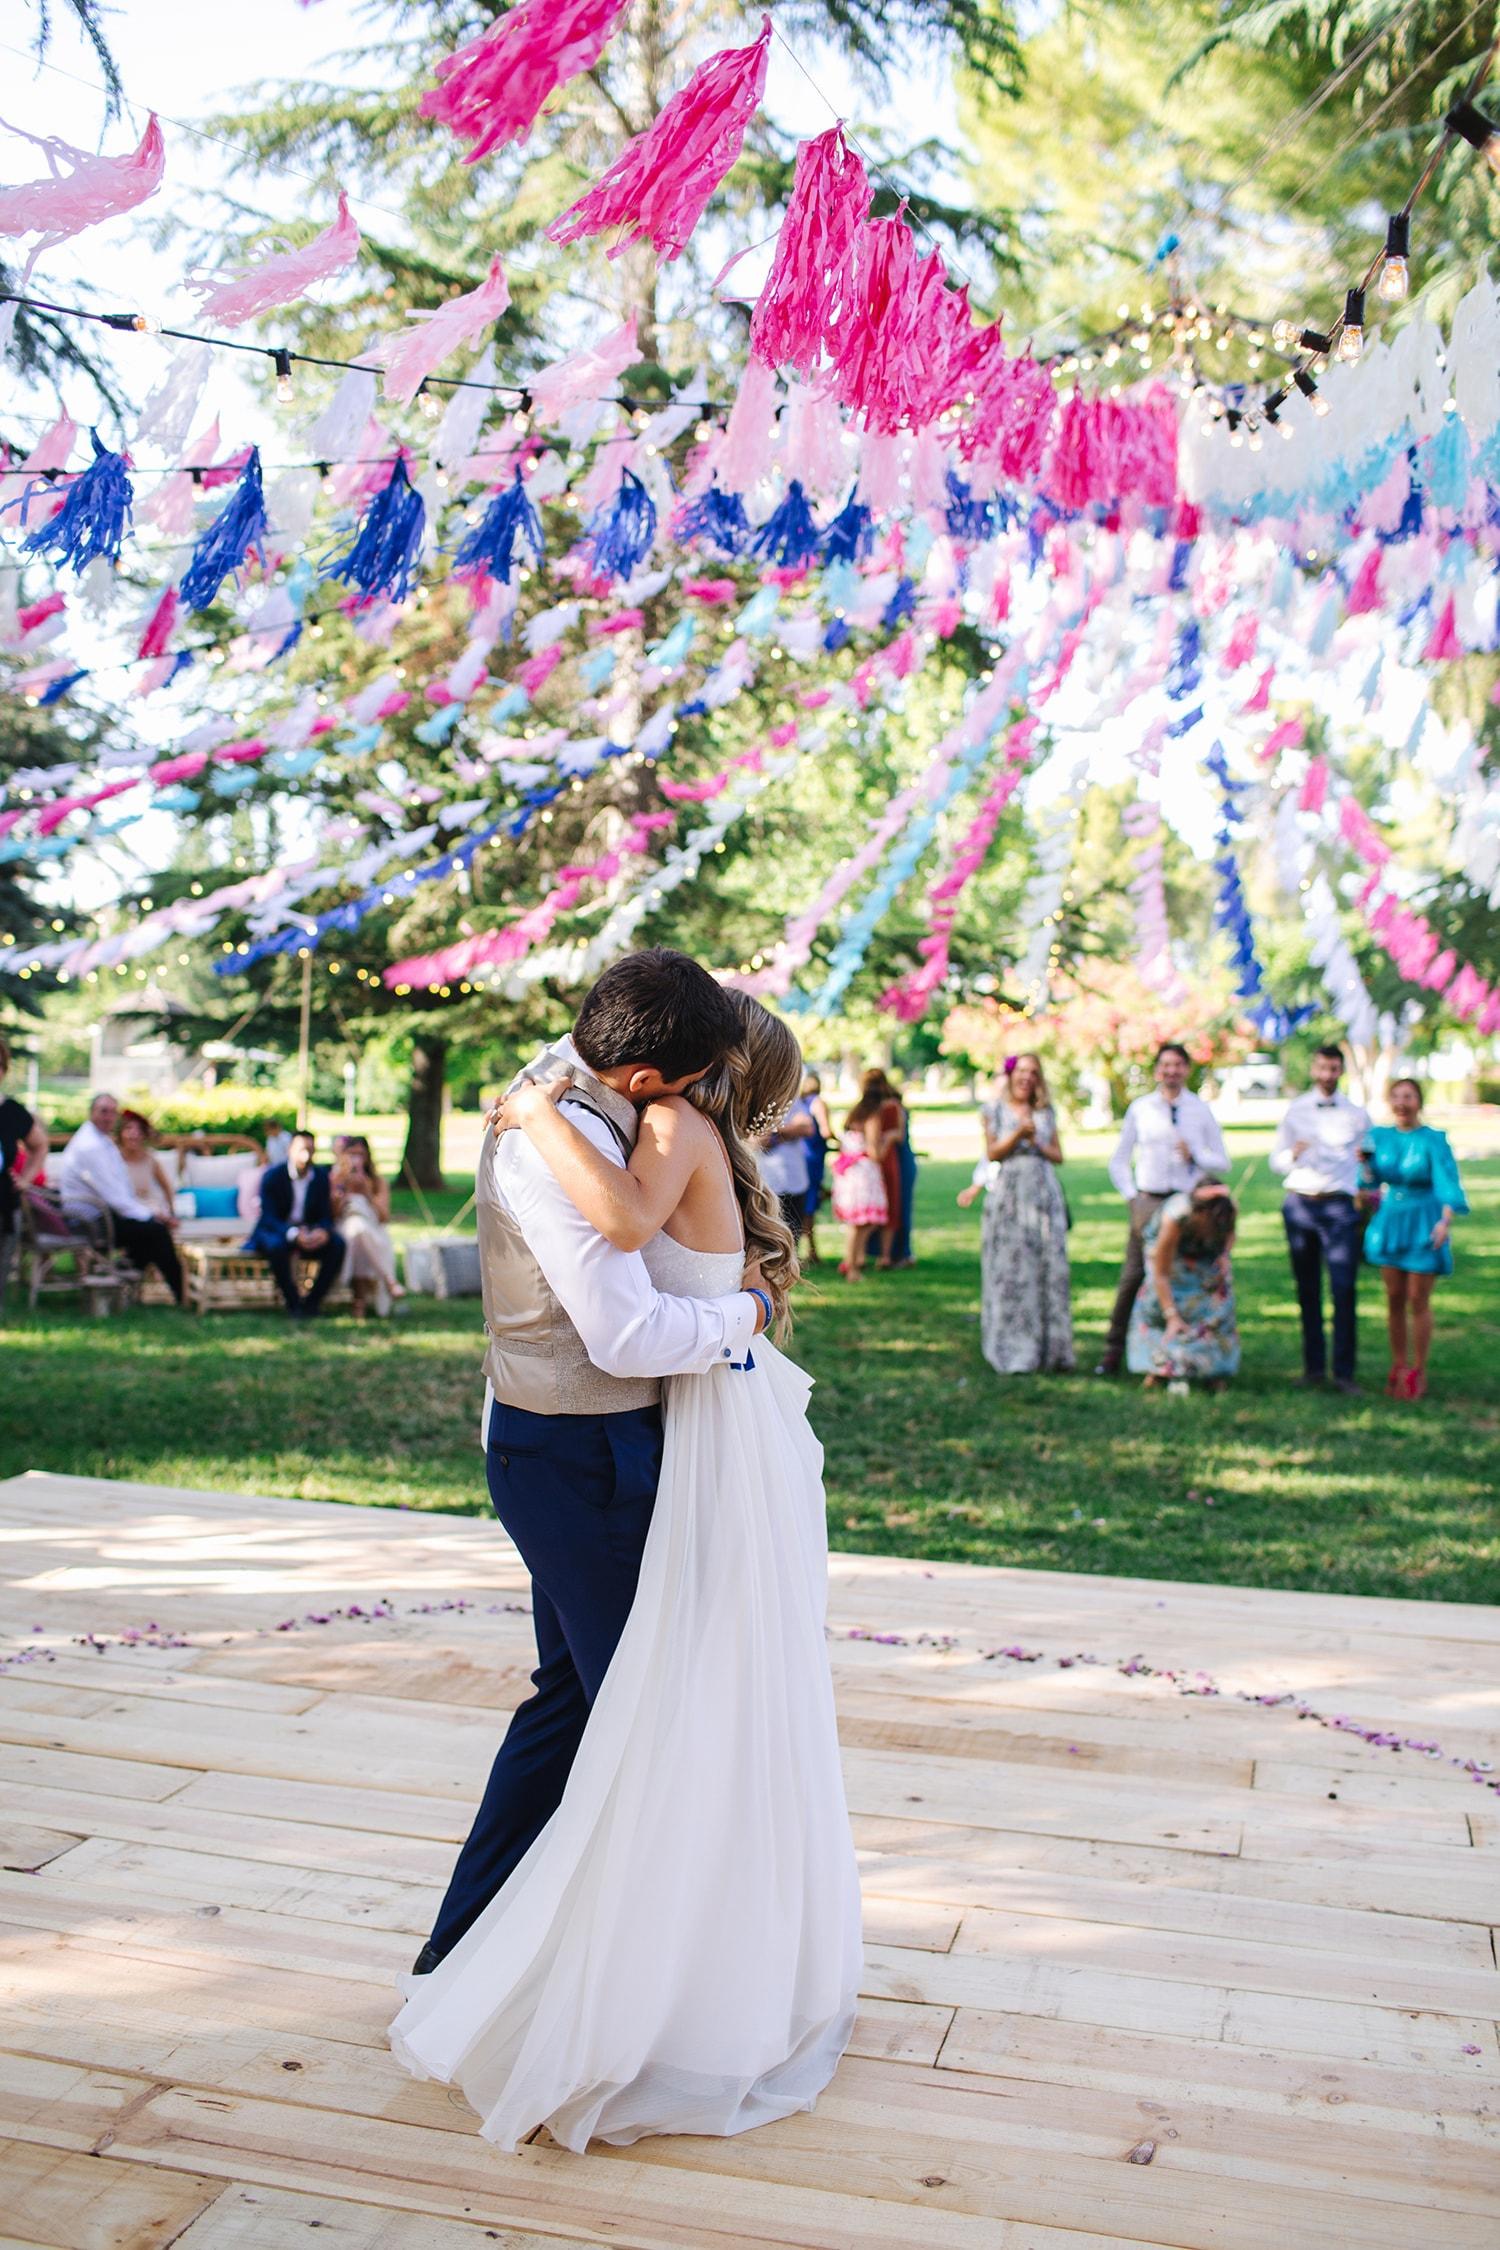 paulagfurio_verbena_wedding_spain_005.jpg